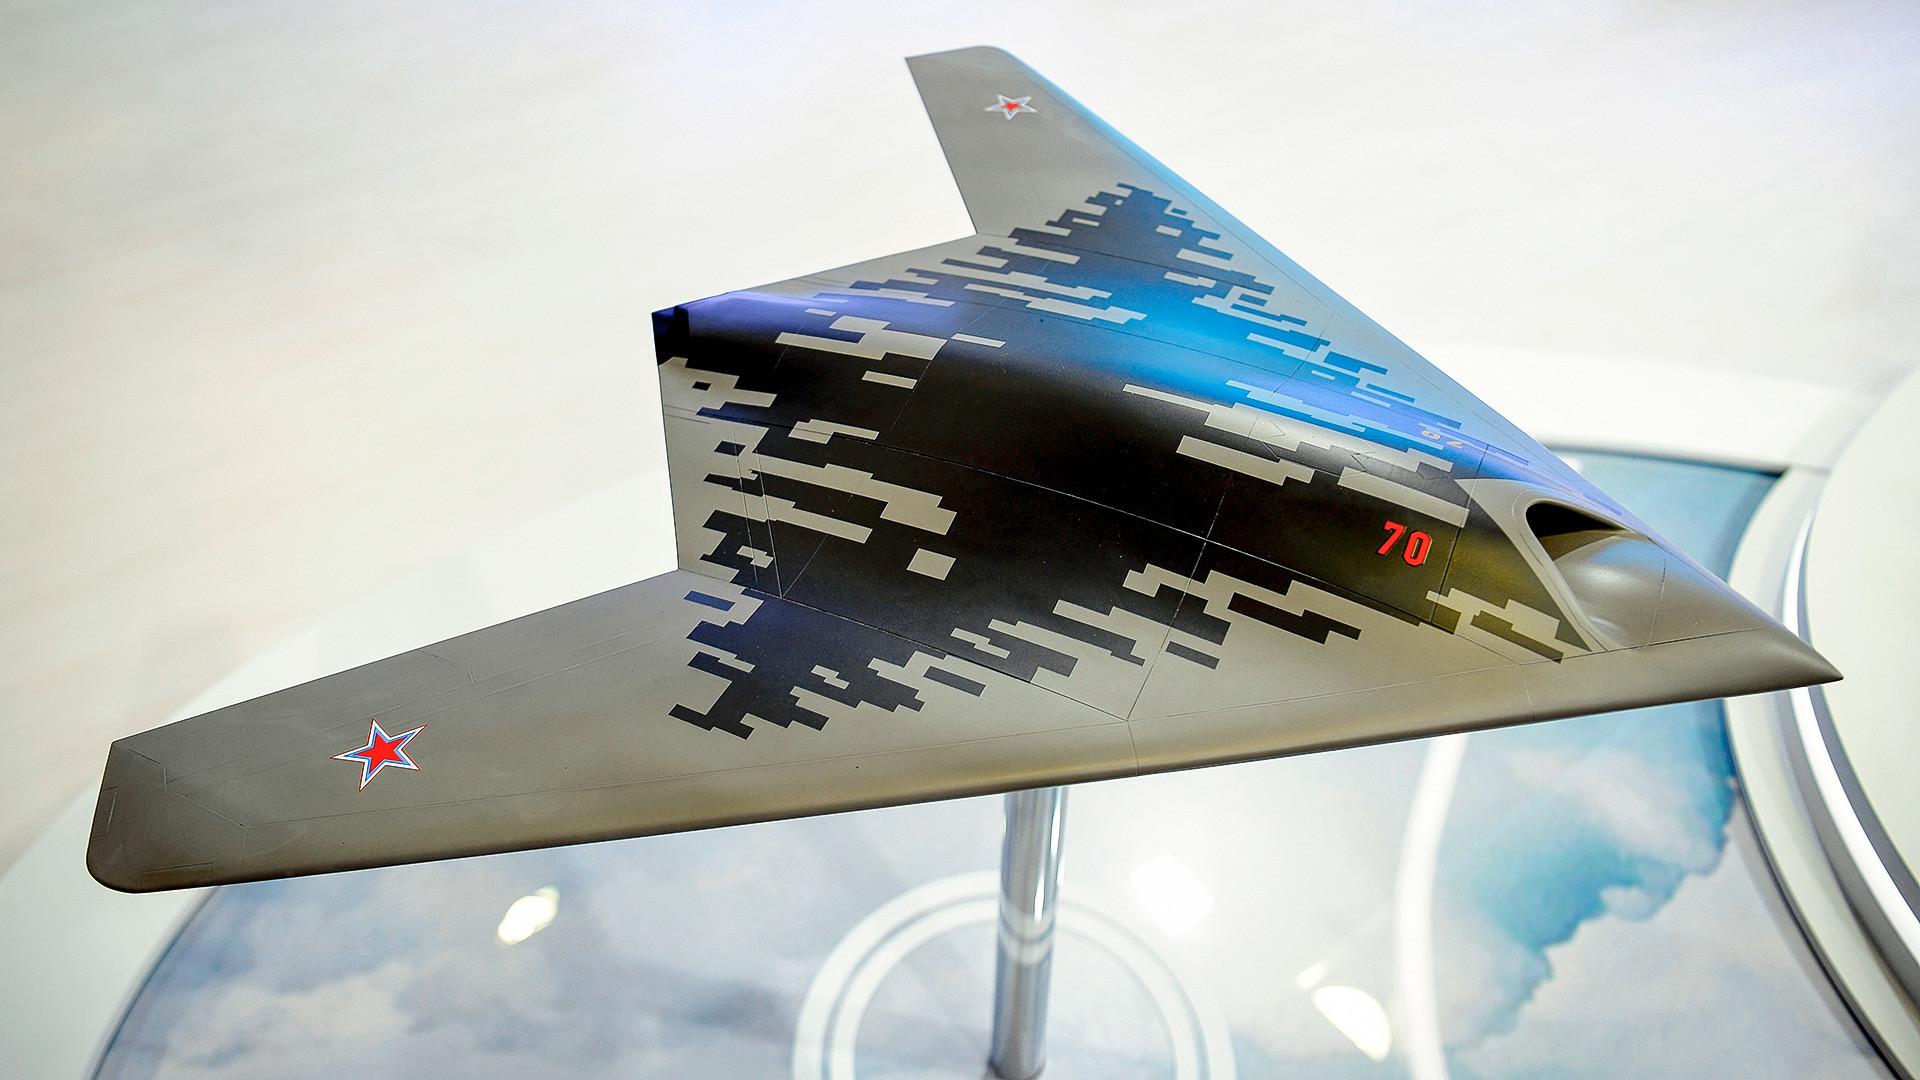 Maketa bespilotne letelice S-70